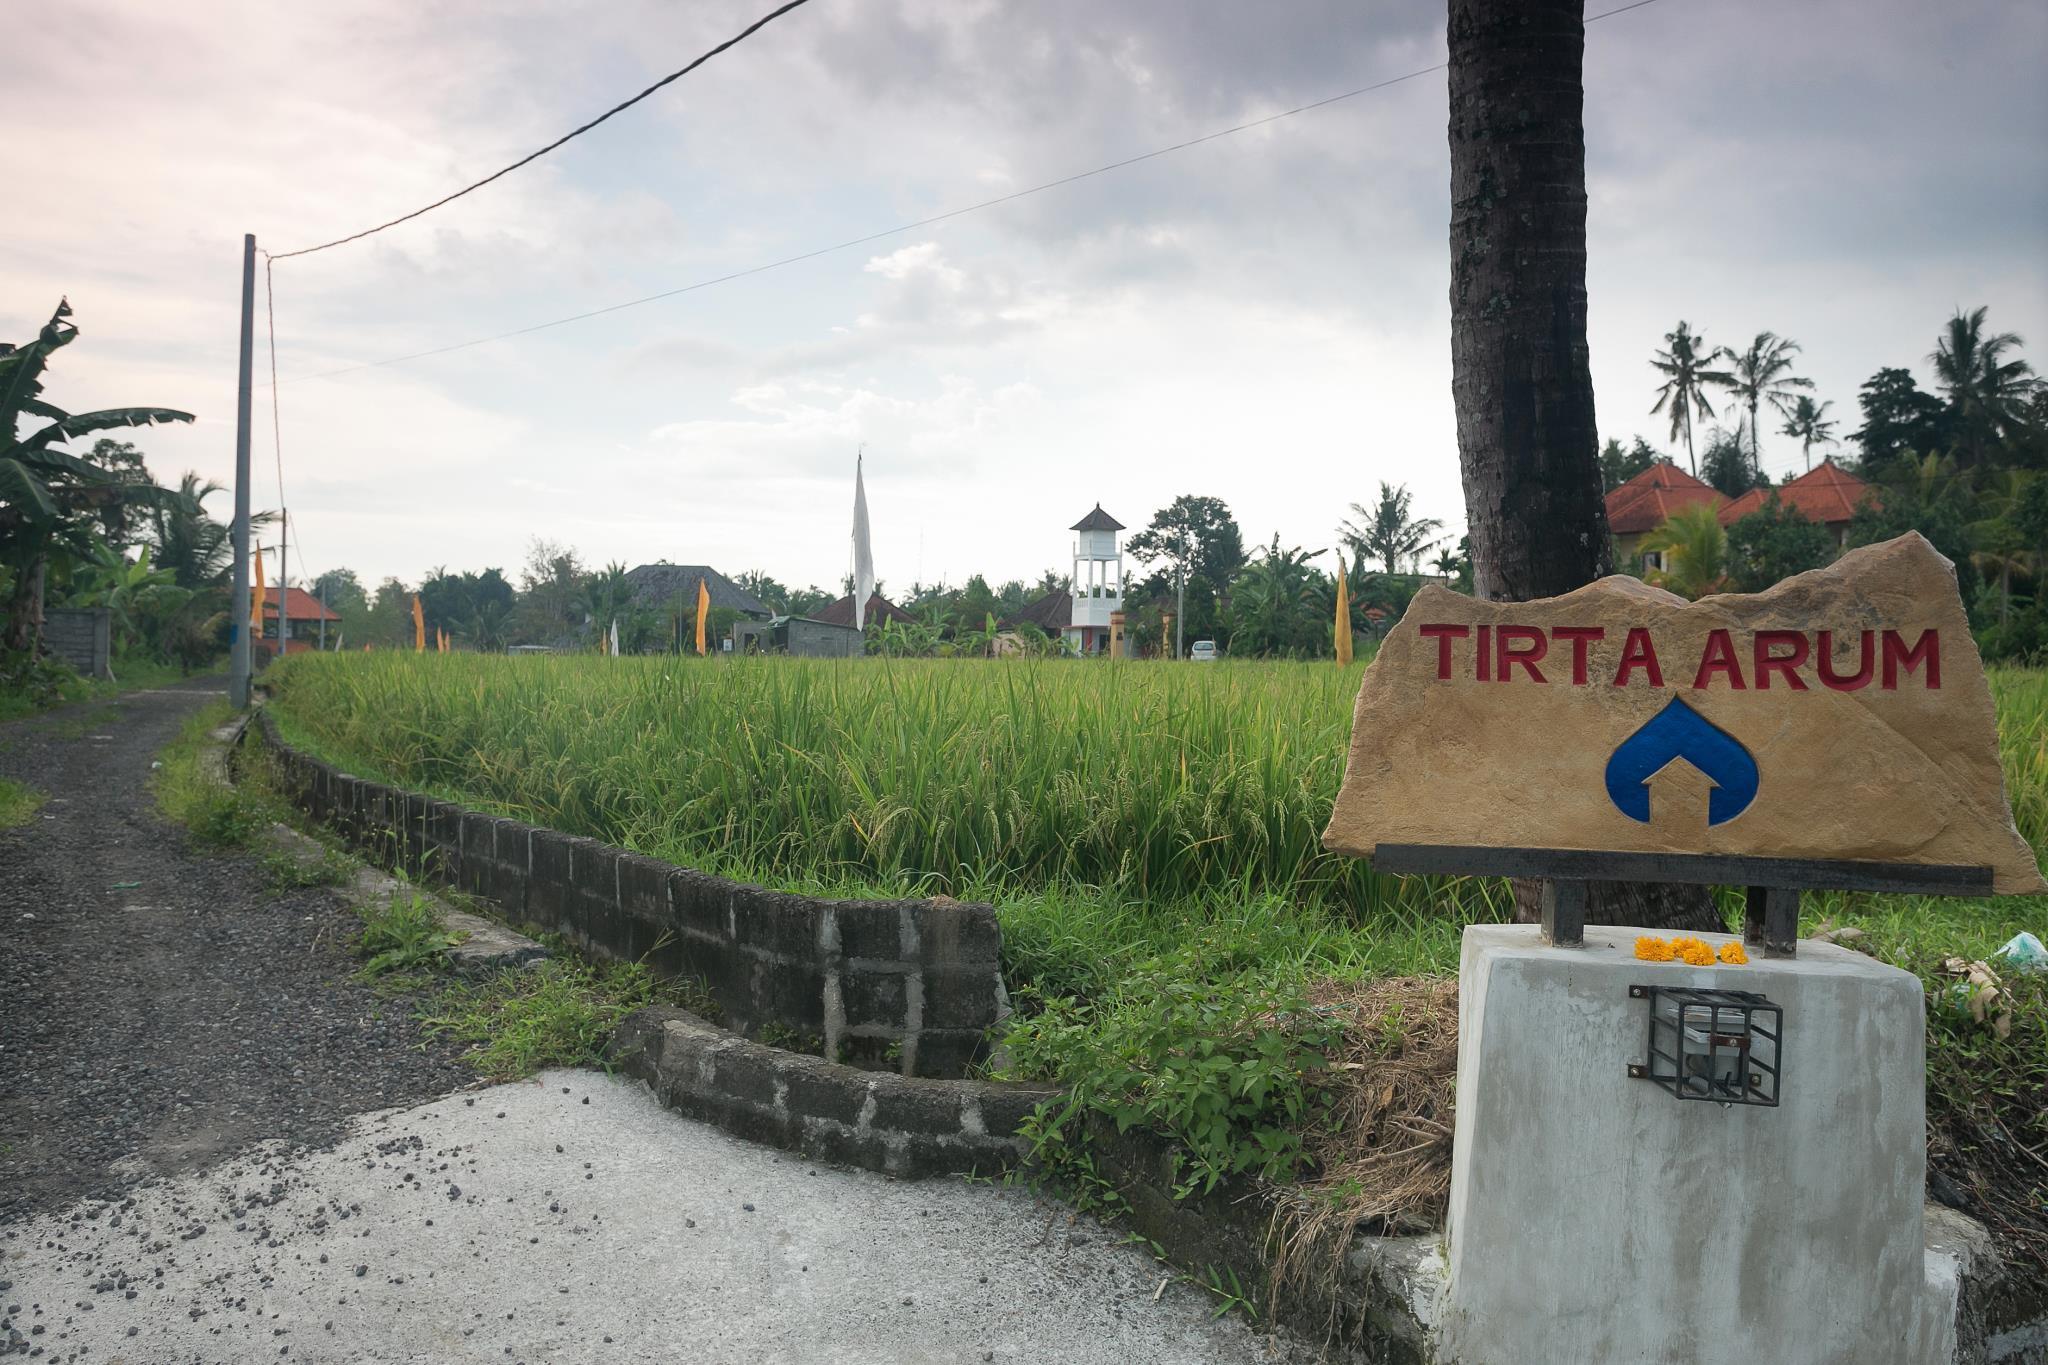 Tirta Arum